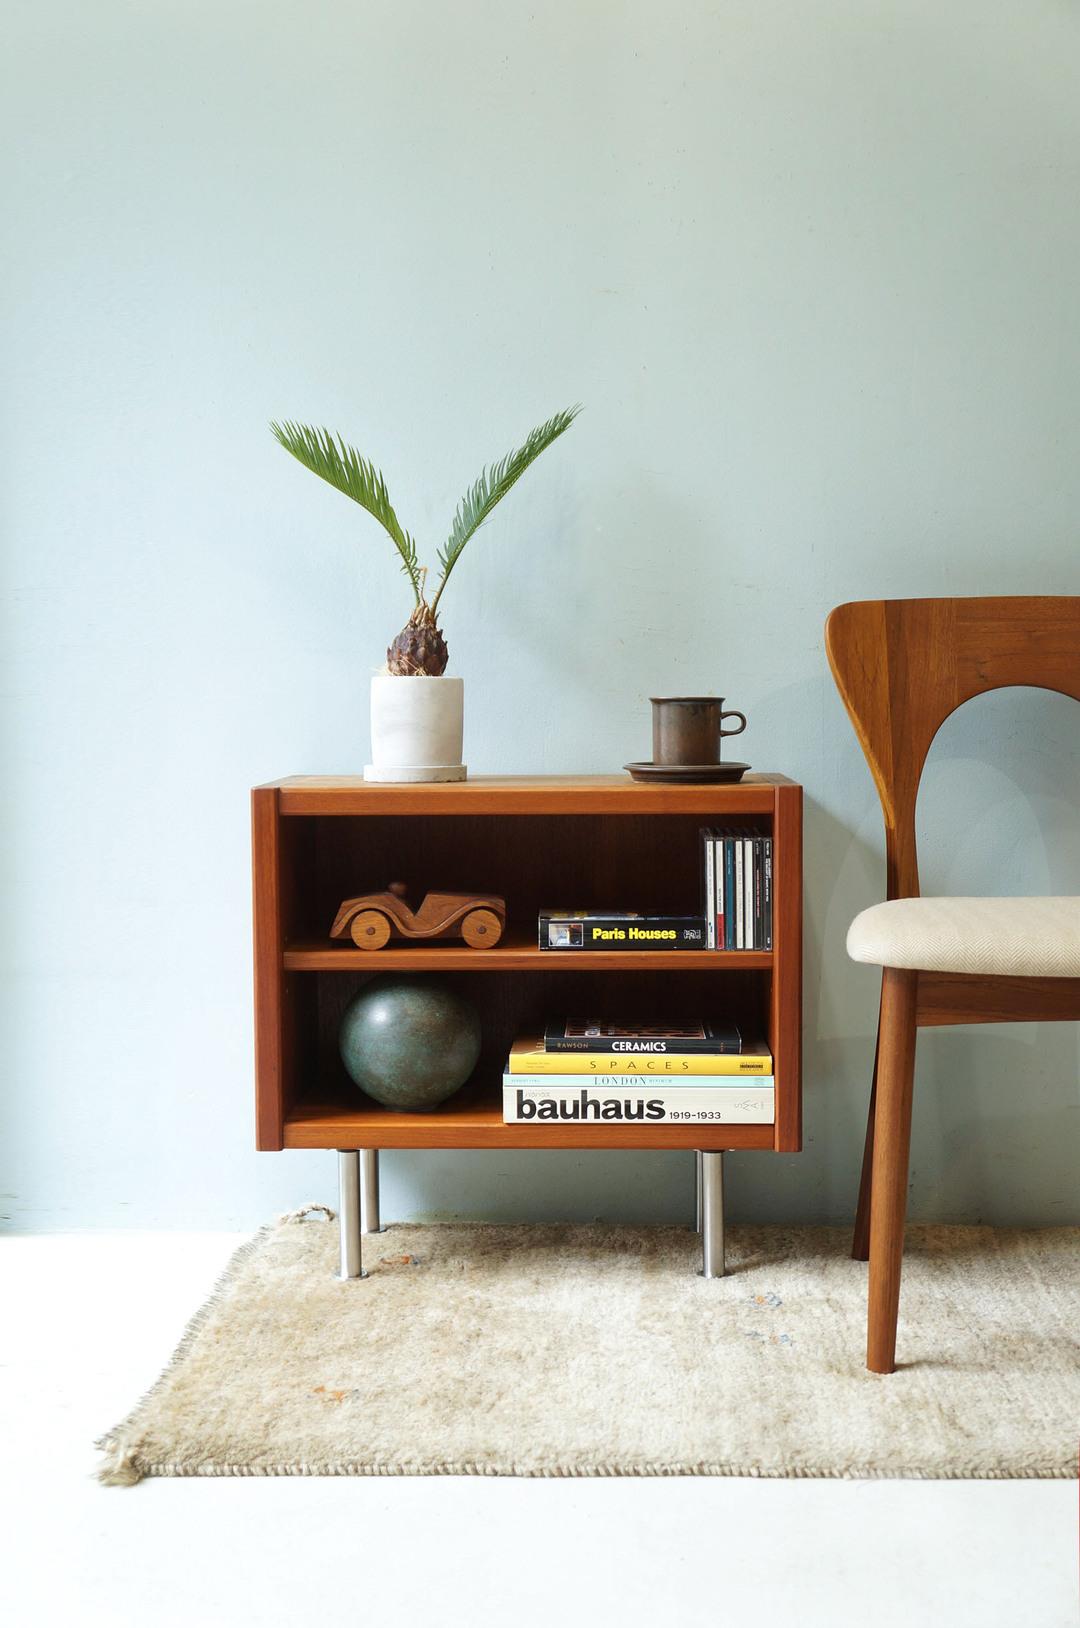 Japanese Vintage Teakwood Small Sideboard/ジャパンヴィンテージ スモールサイドボード テレビボード チーク材 北欧モダンデザイン 小